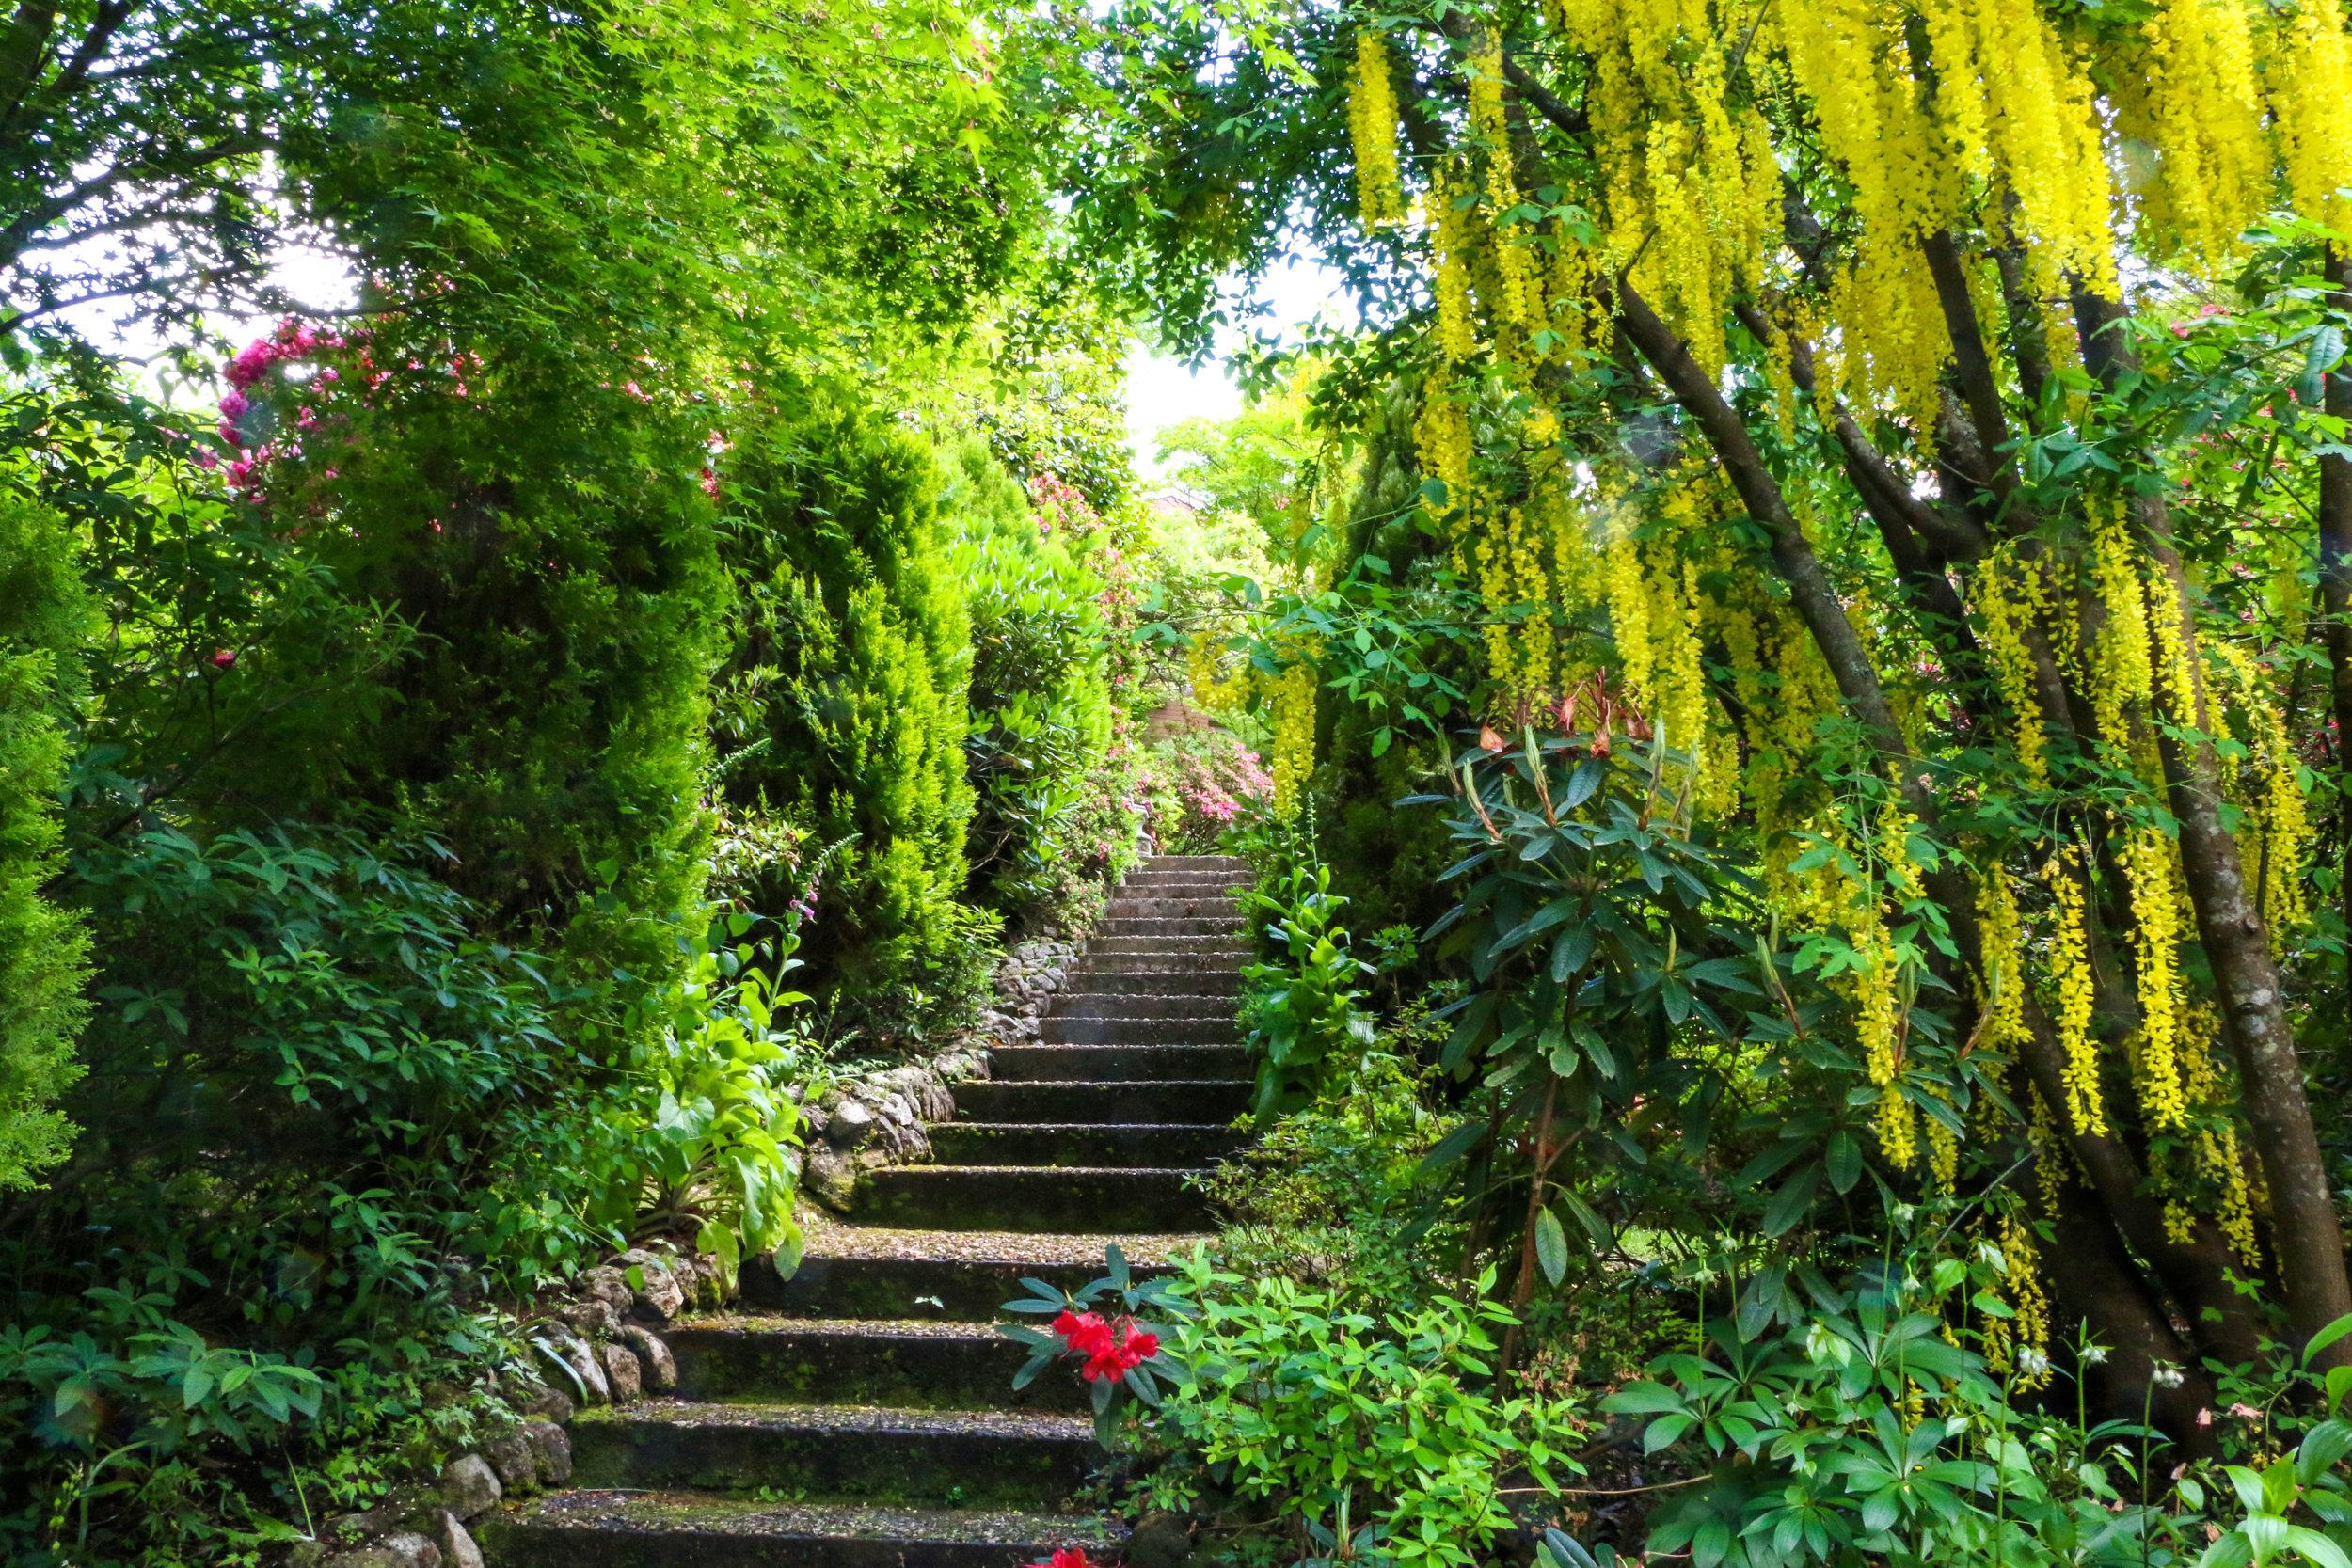 9430 laburnum and steps wf.jpg